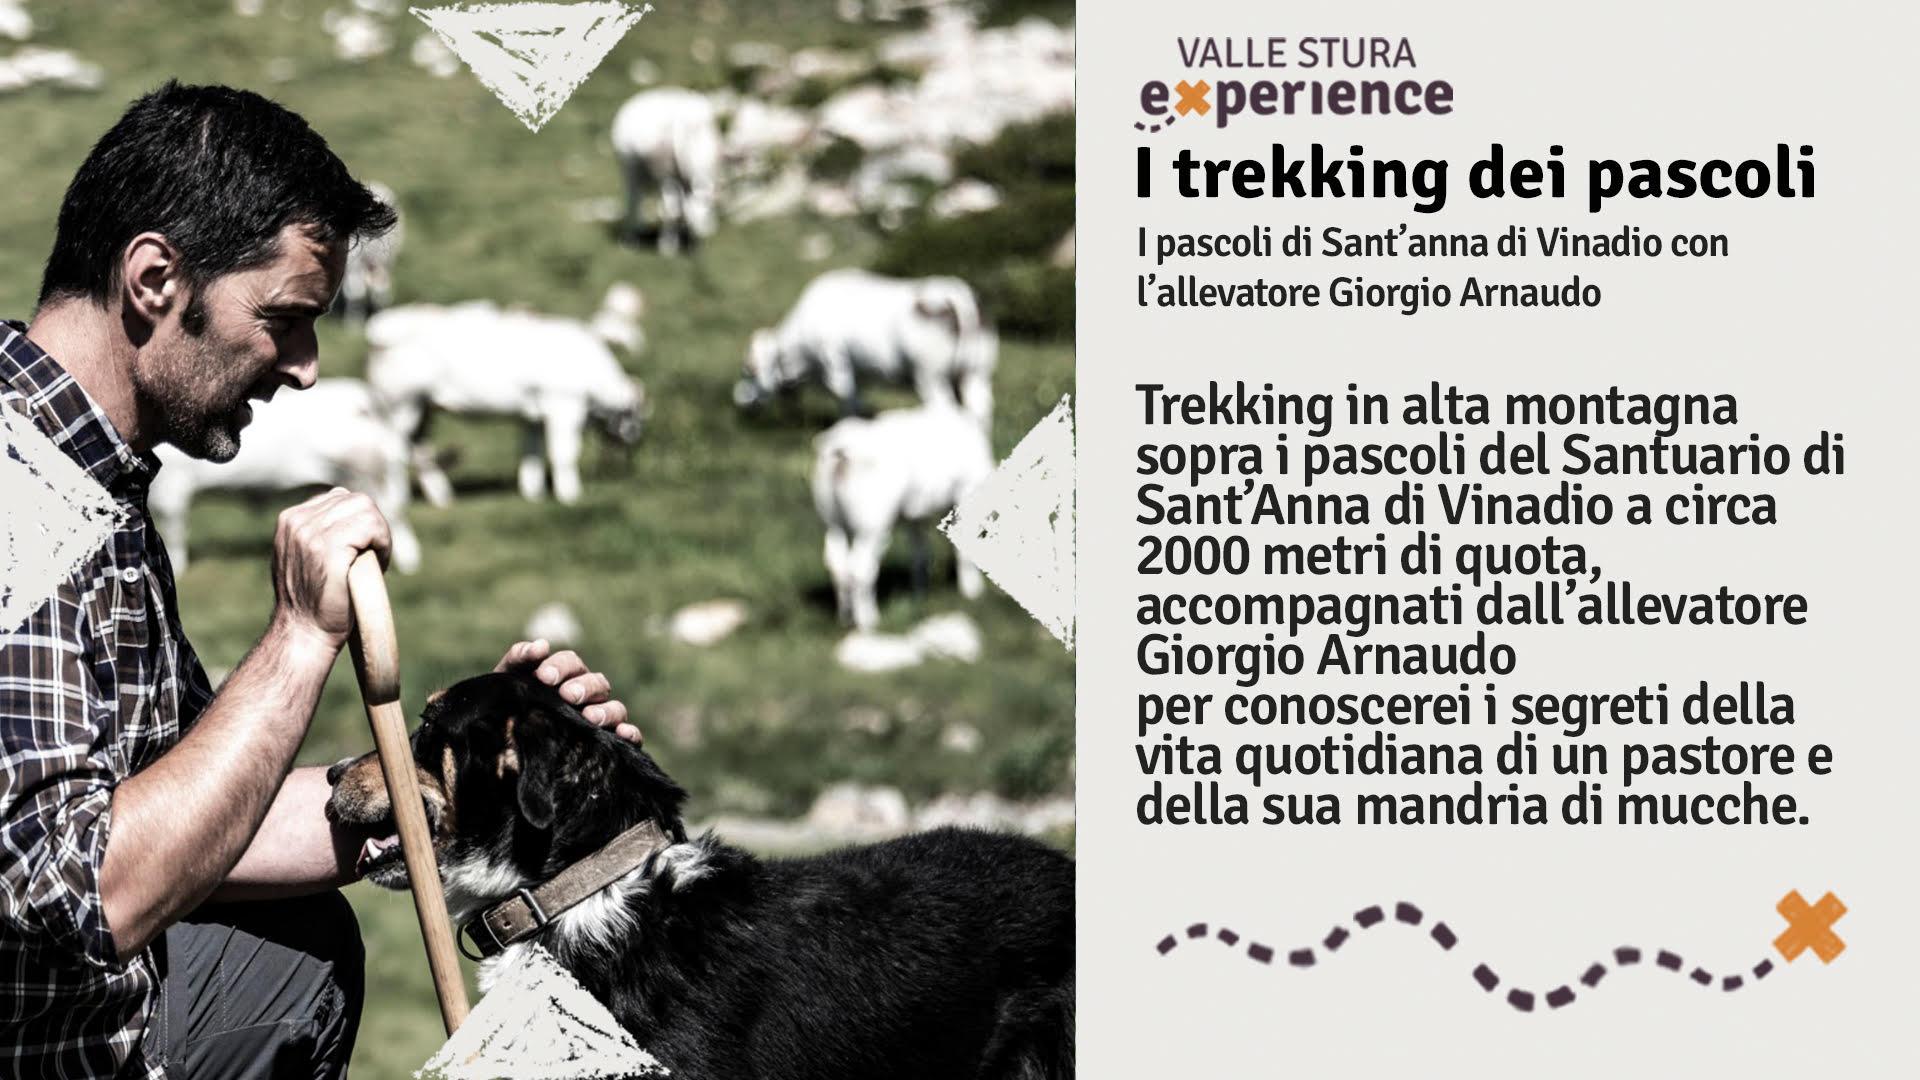 valle_stura_i_trekking_dei_pascoli